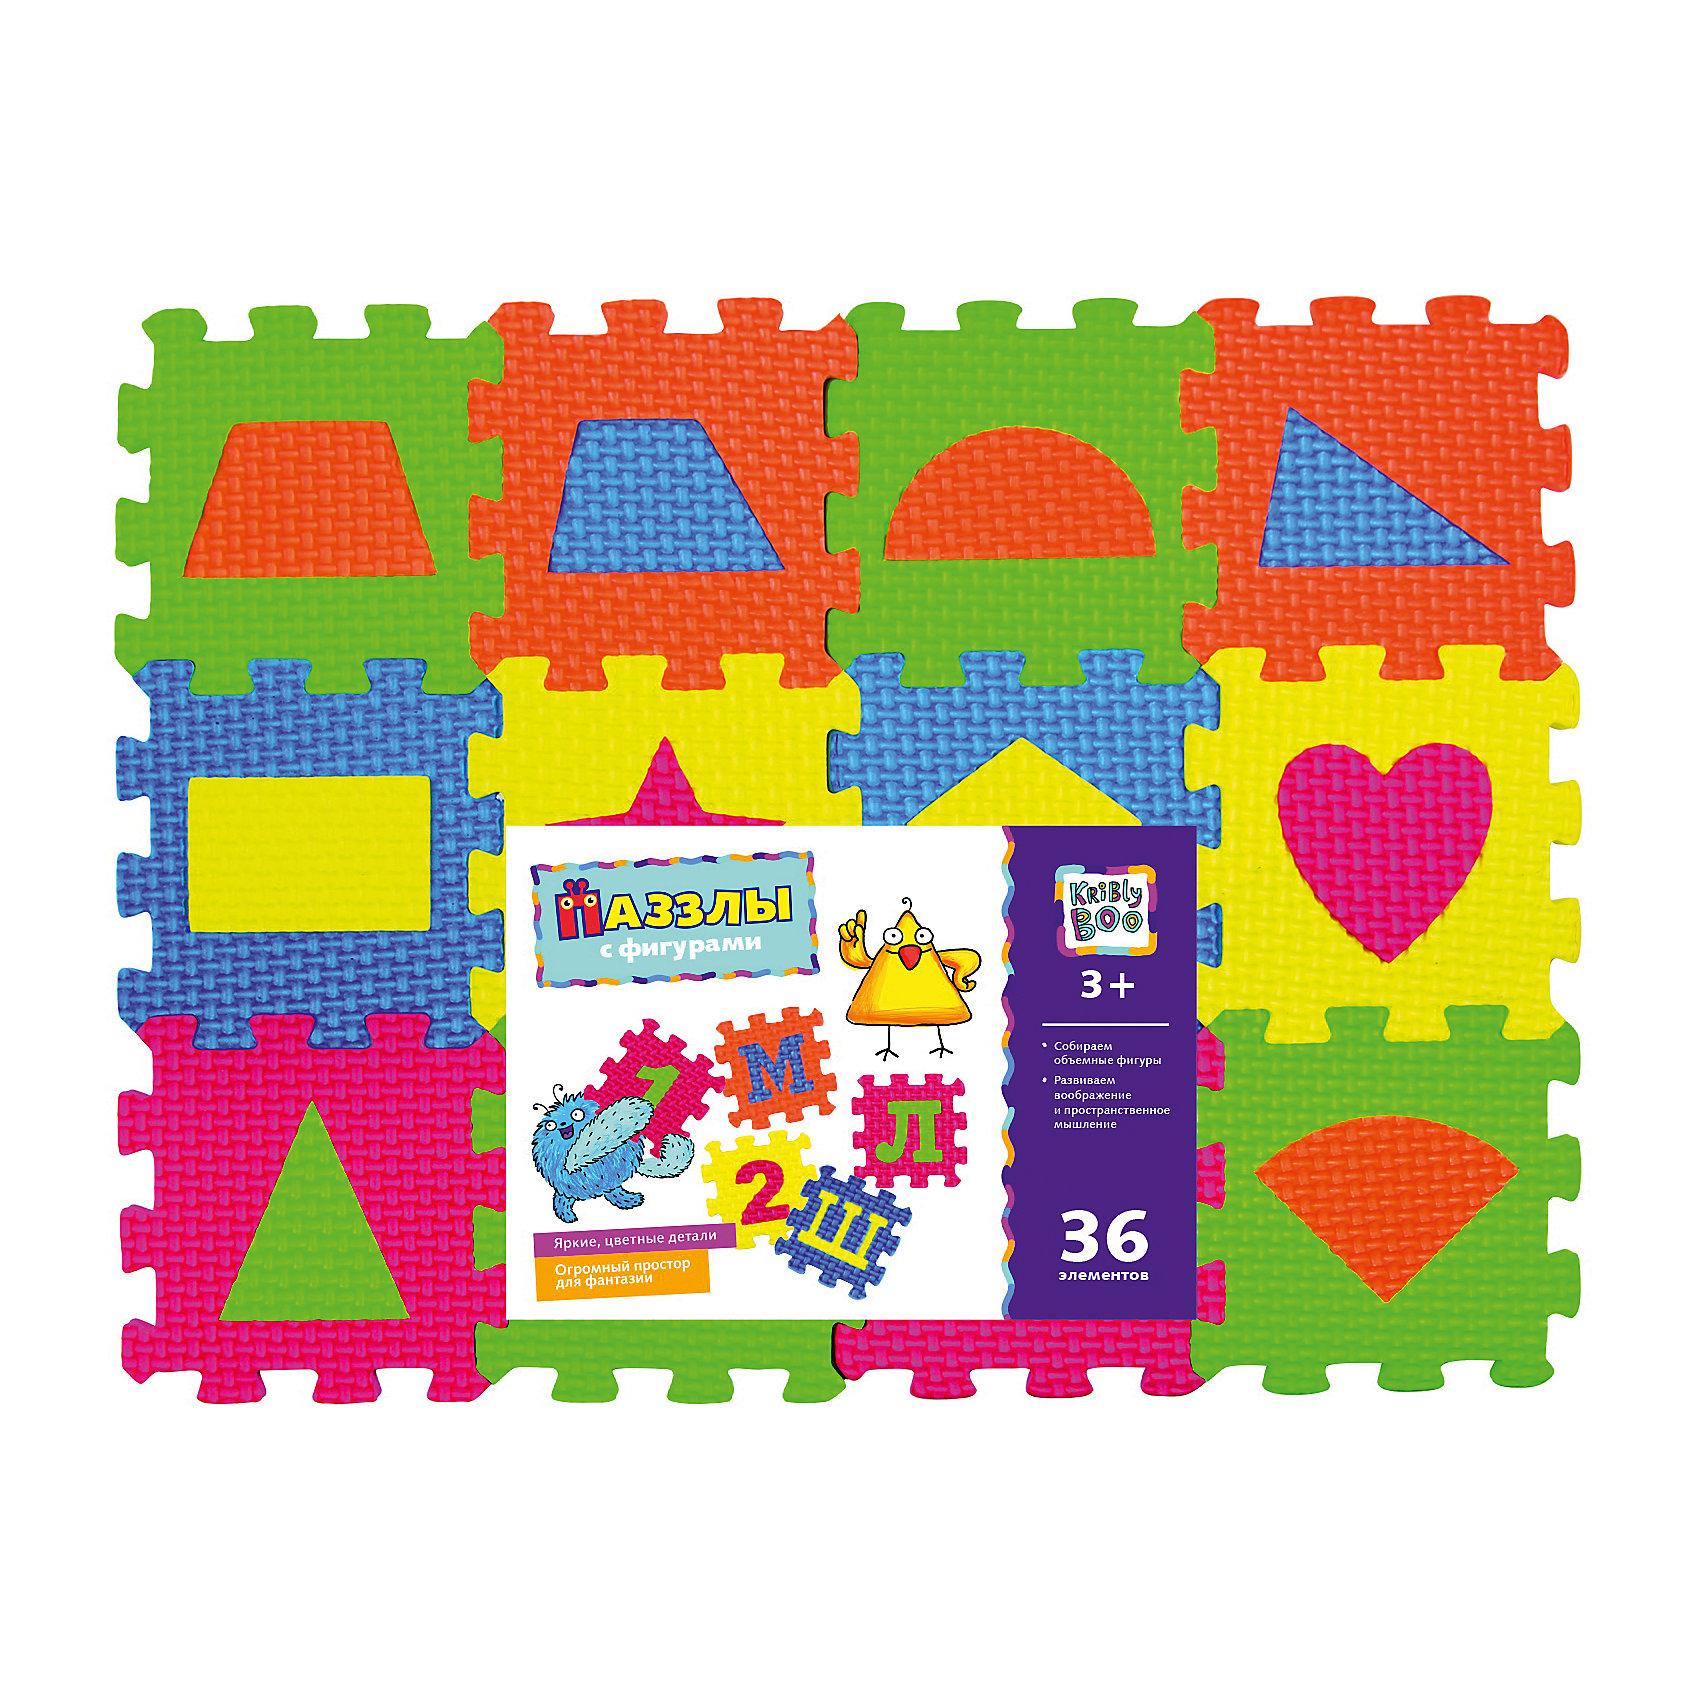 Kribly Boo Пазлы с фигурами, 36 элементов пазлы origami пазл дм зайчик и волчонок 25 элементов